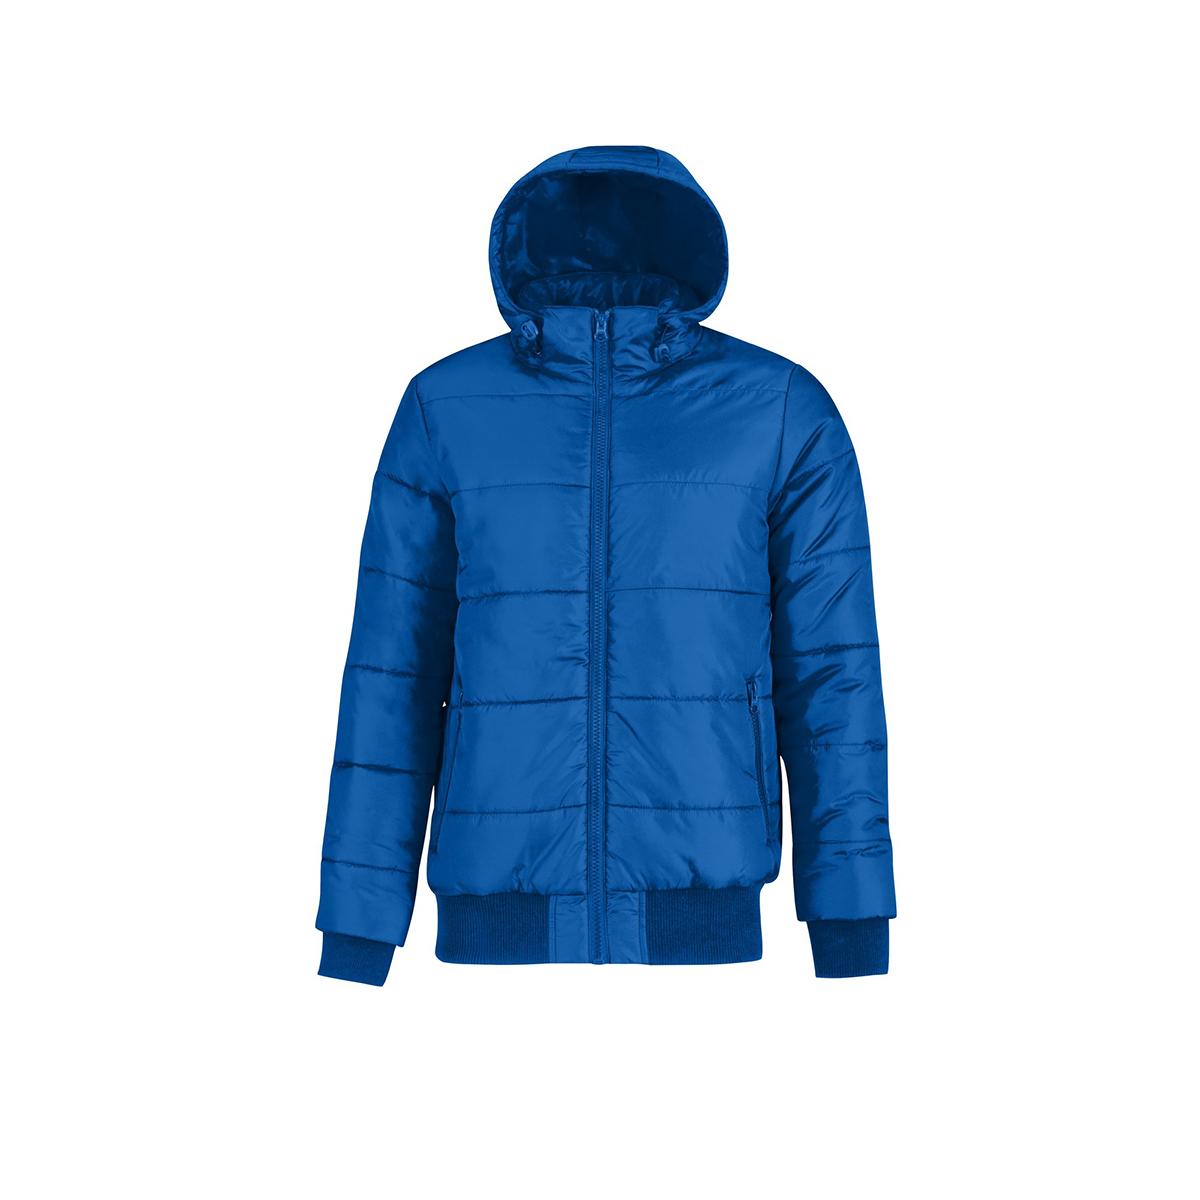 B&C Mens Superhood Padded Bomber Jacket (XL) (Royal Blue/ Neon Orange)